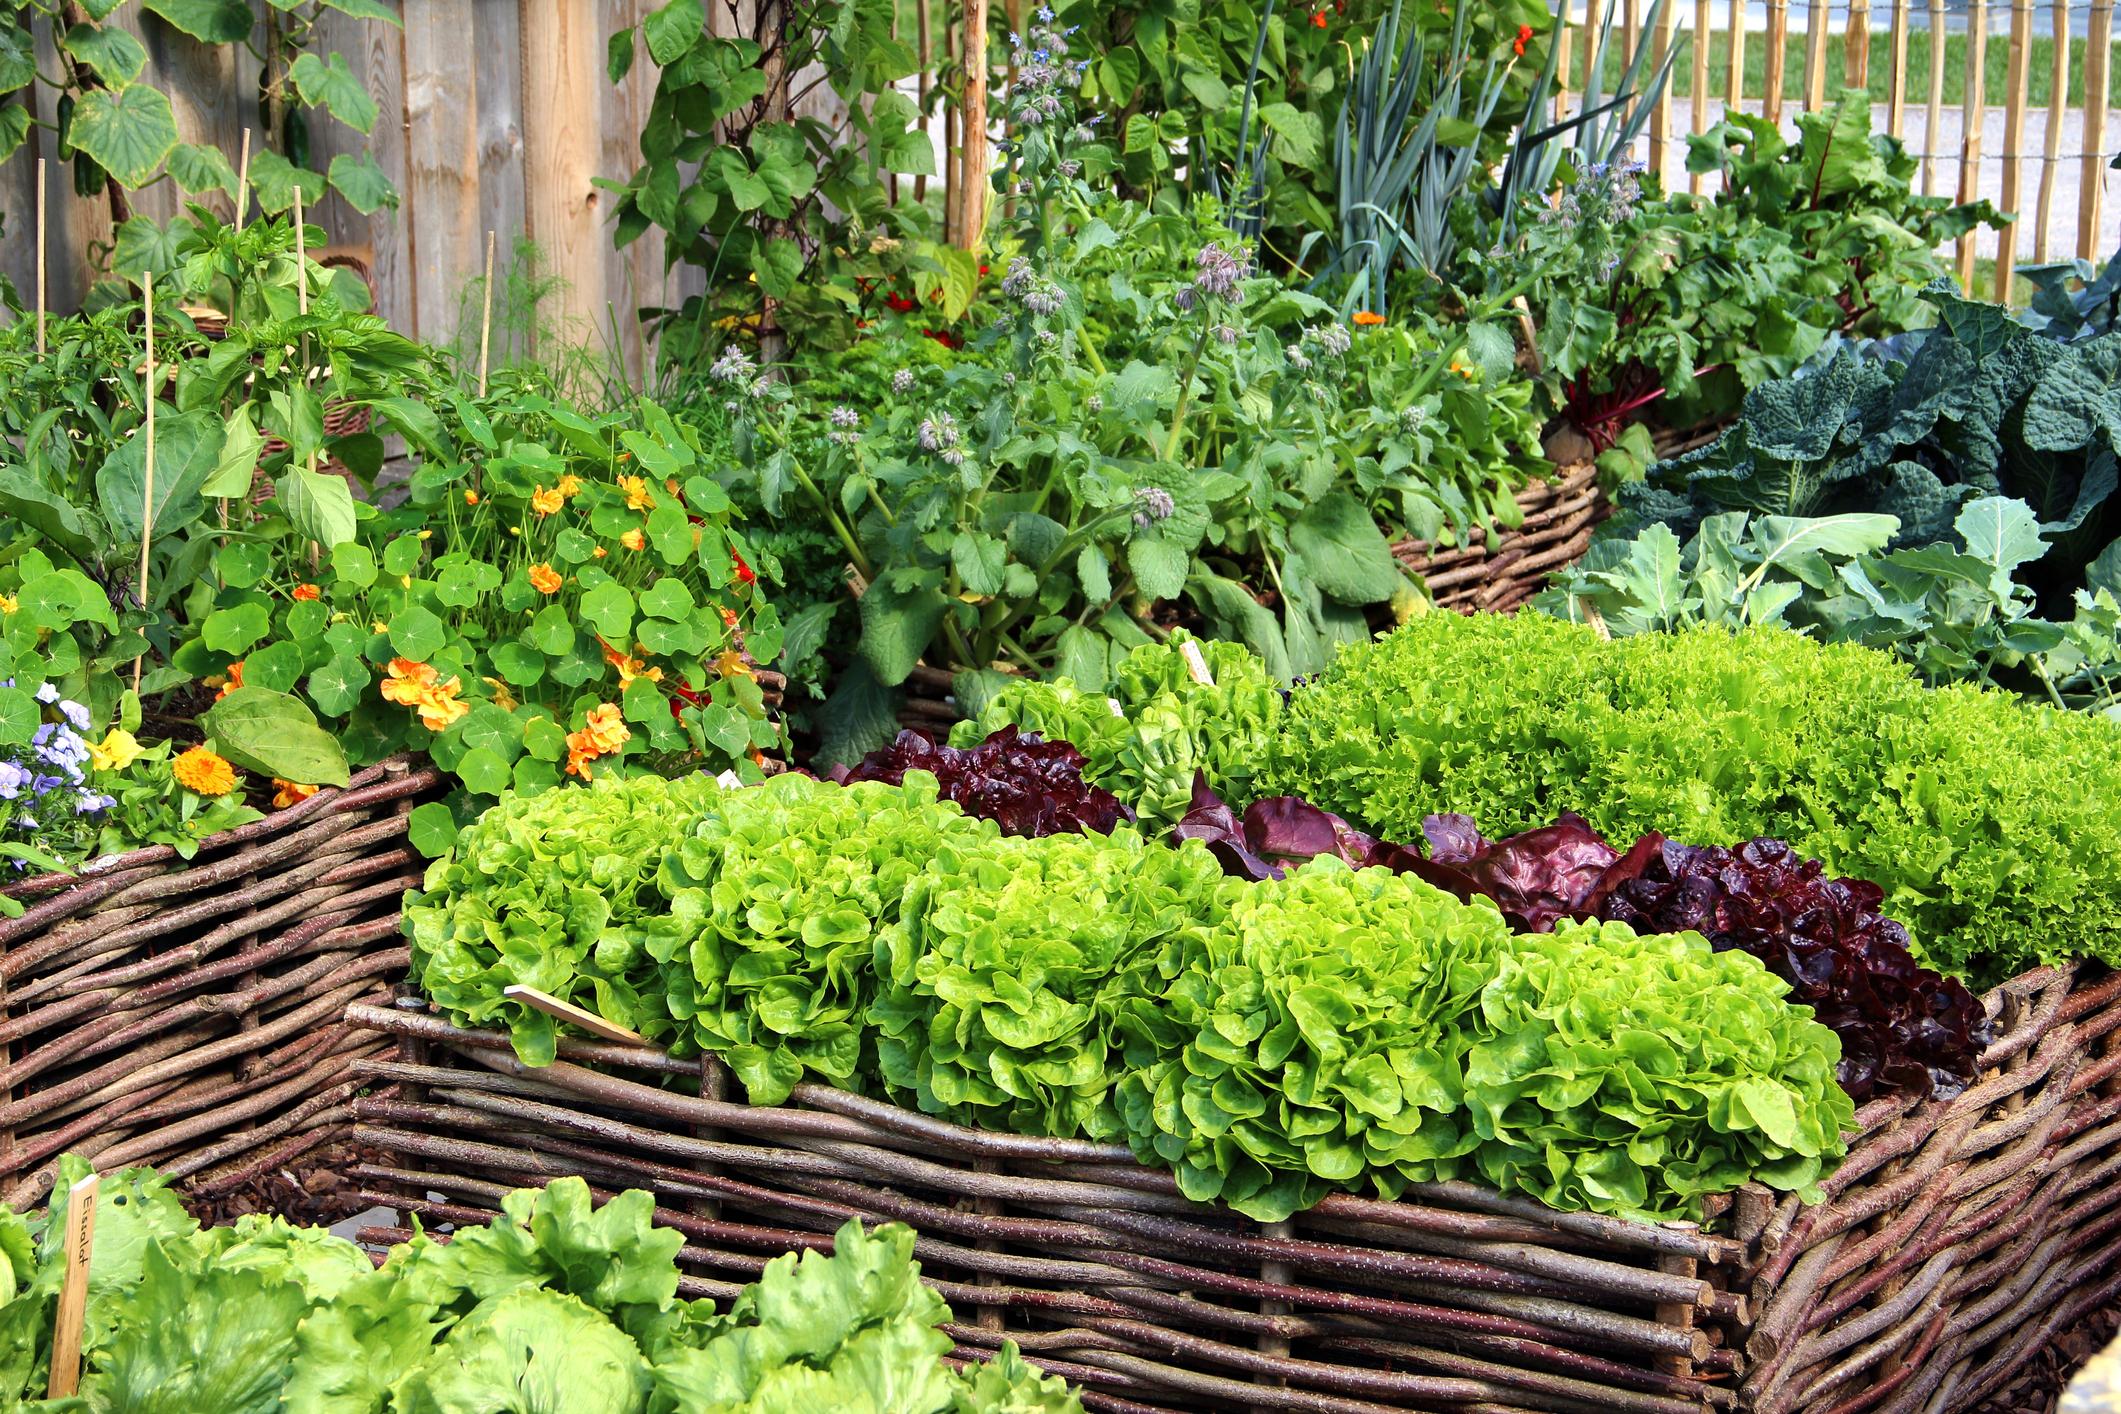 Planter boxes full of vegetables